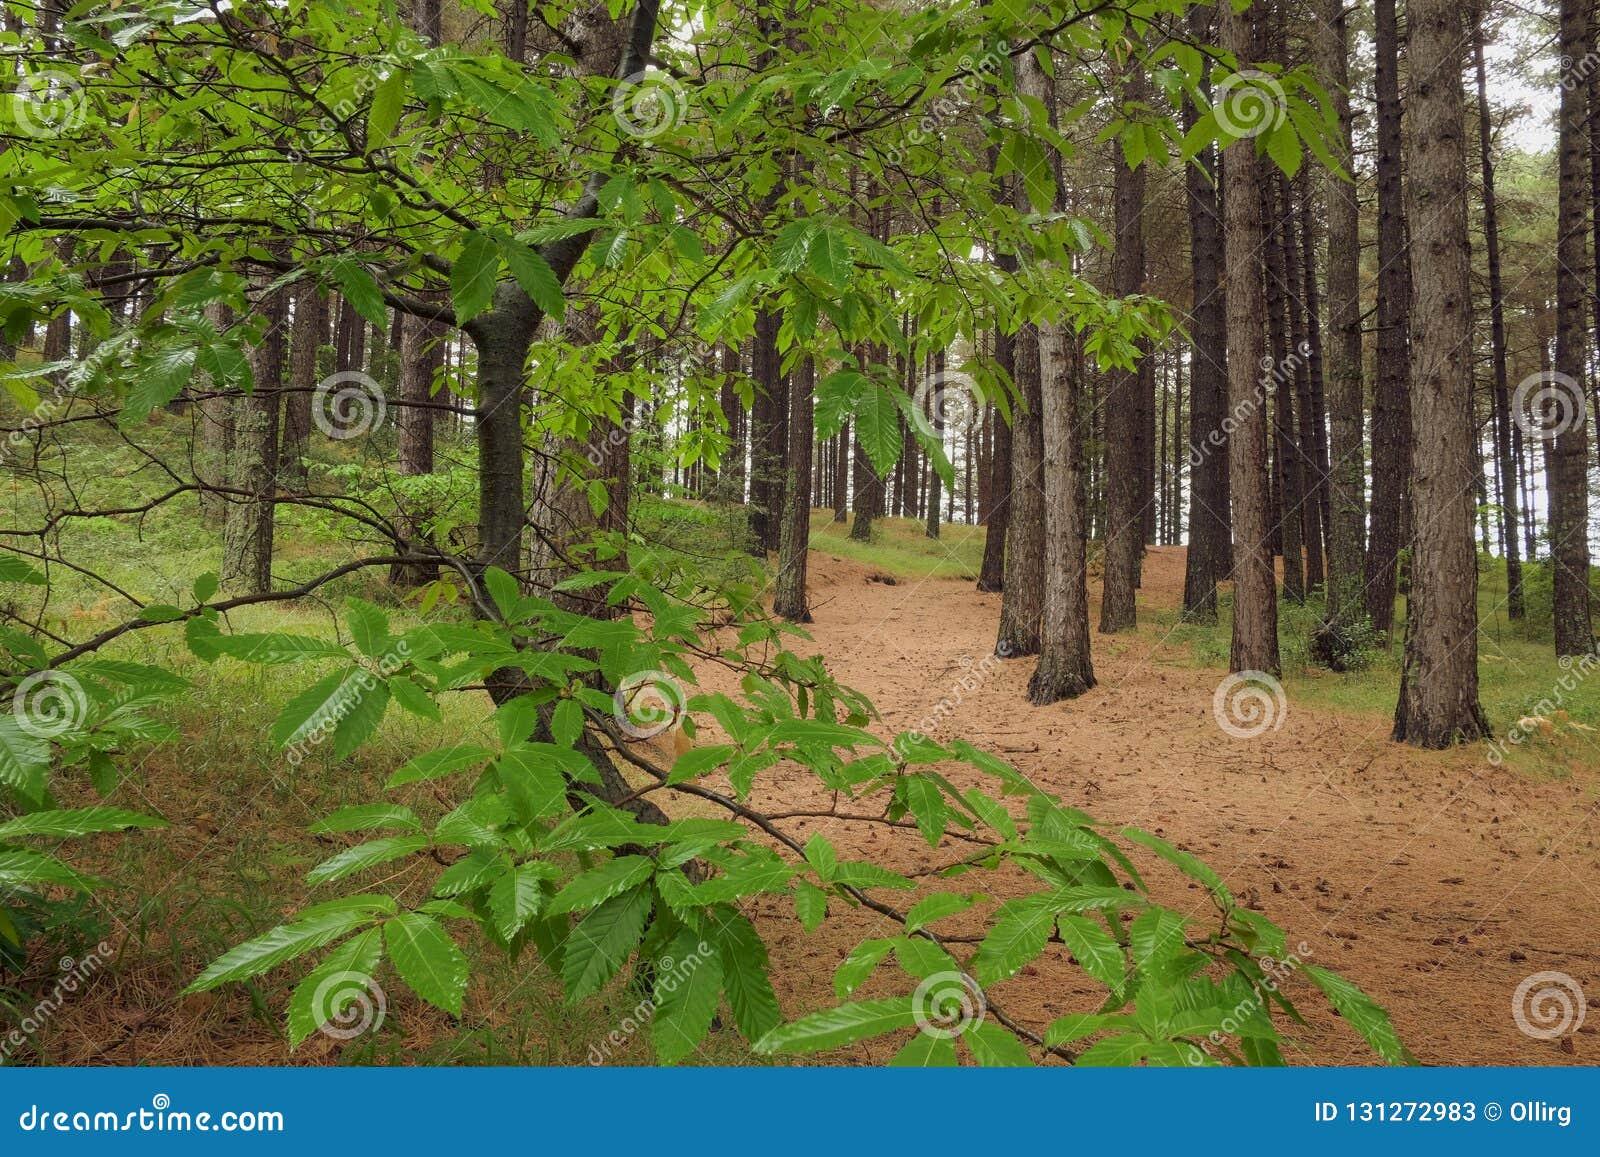 Chestnut Leaves In Forest Pines Of Etna Park, Sicily